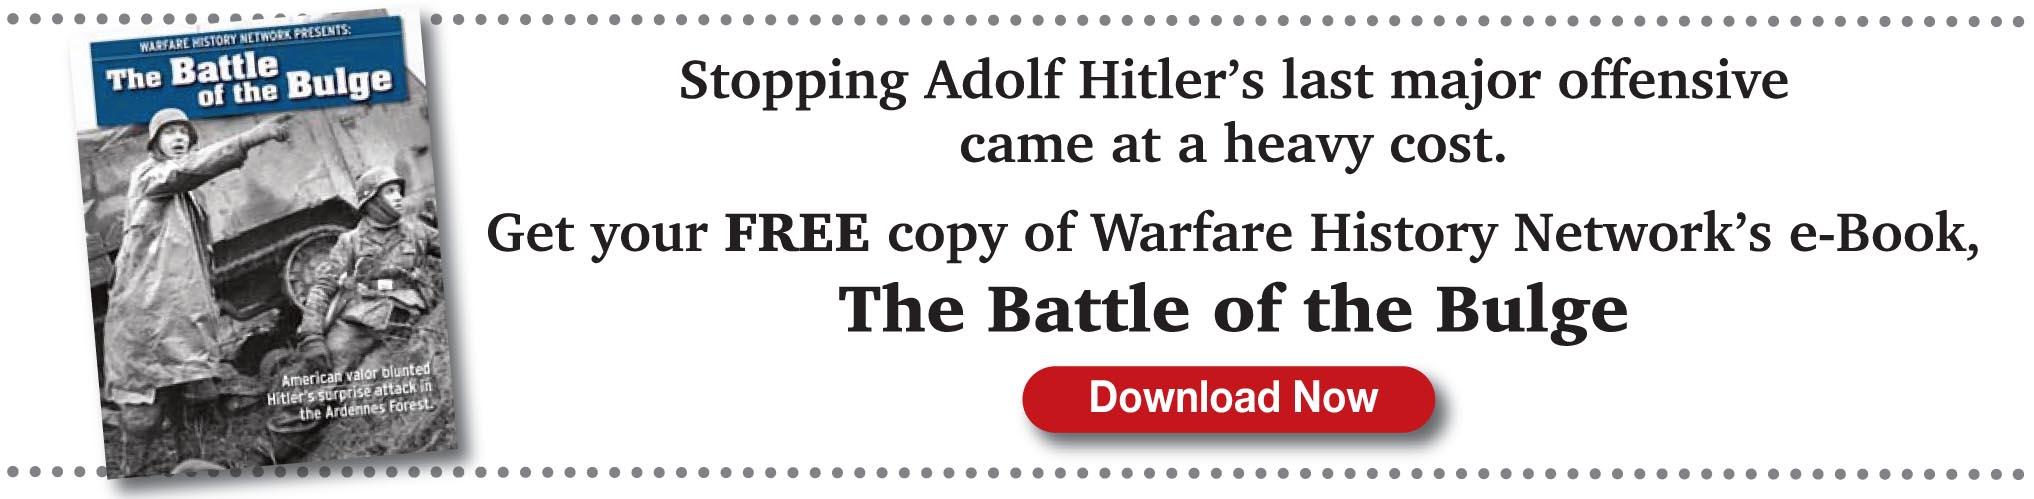 Battle of the Bulge free e-book